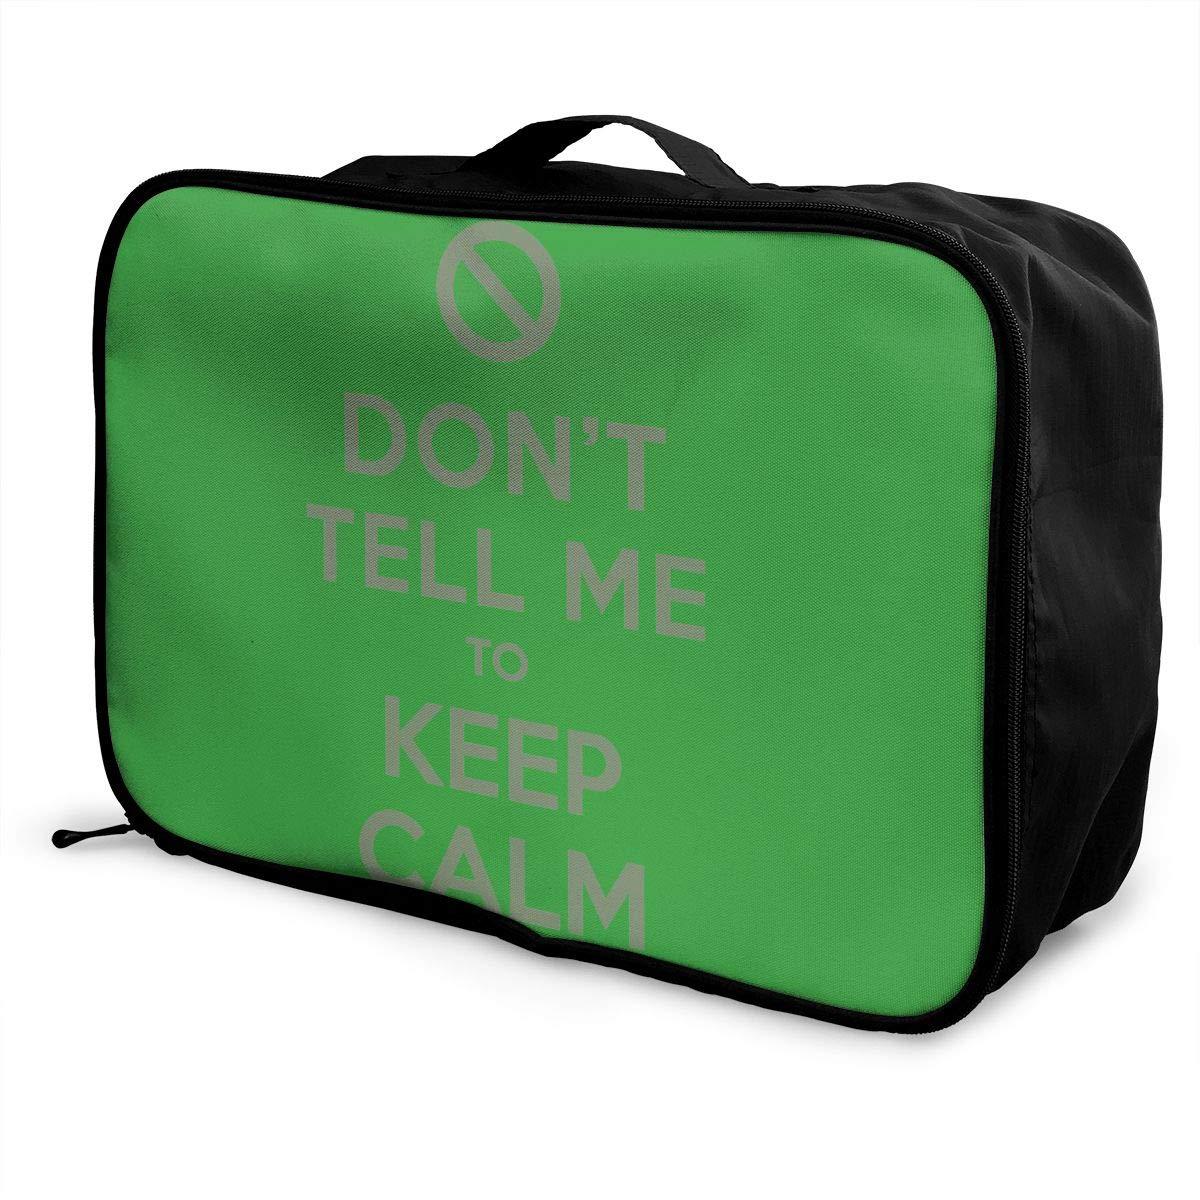 Travel Luggage Duffle Bag Lightweight Portable Handbag Heart Large Capacity Waterproof Foldable Storage Tote